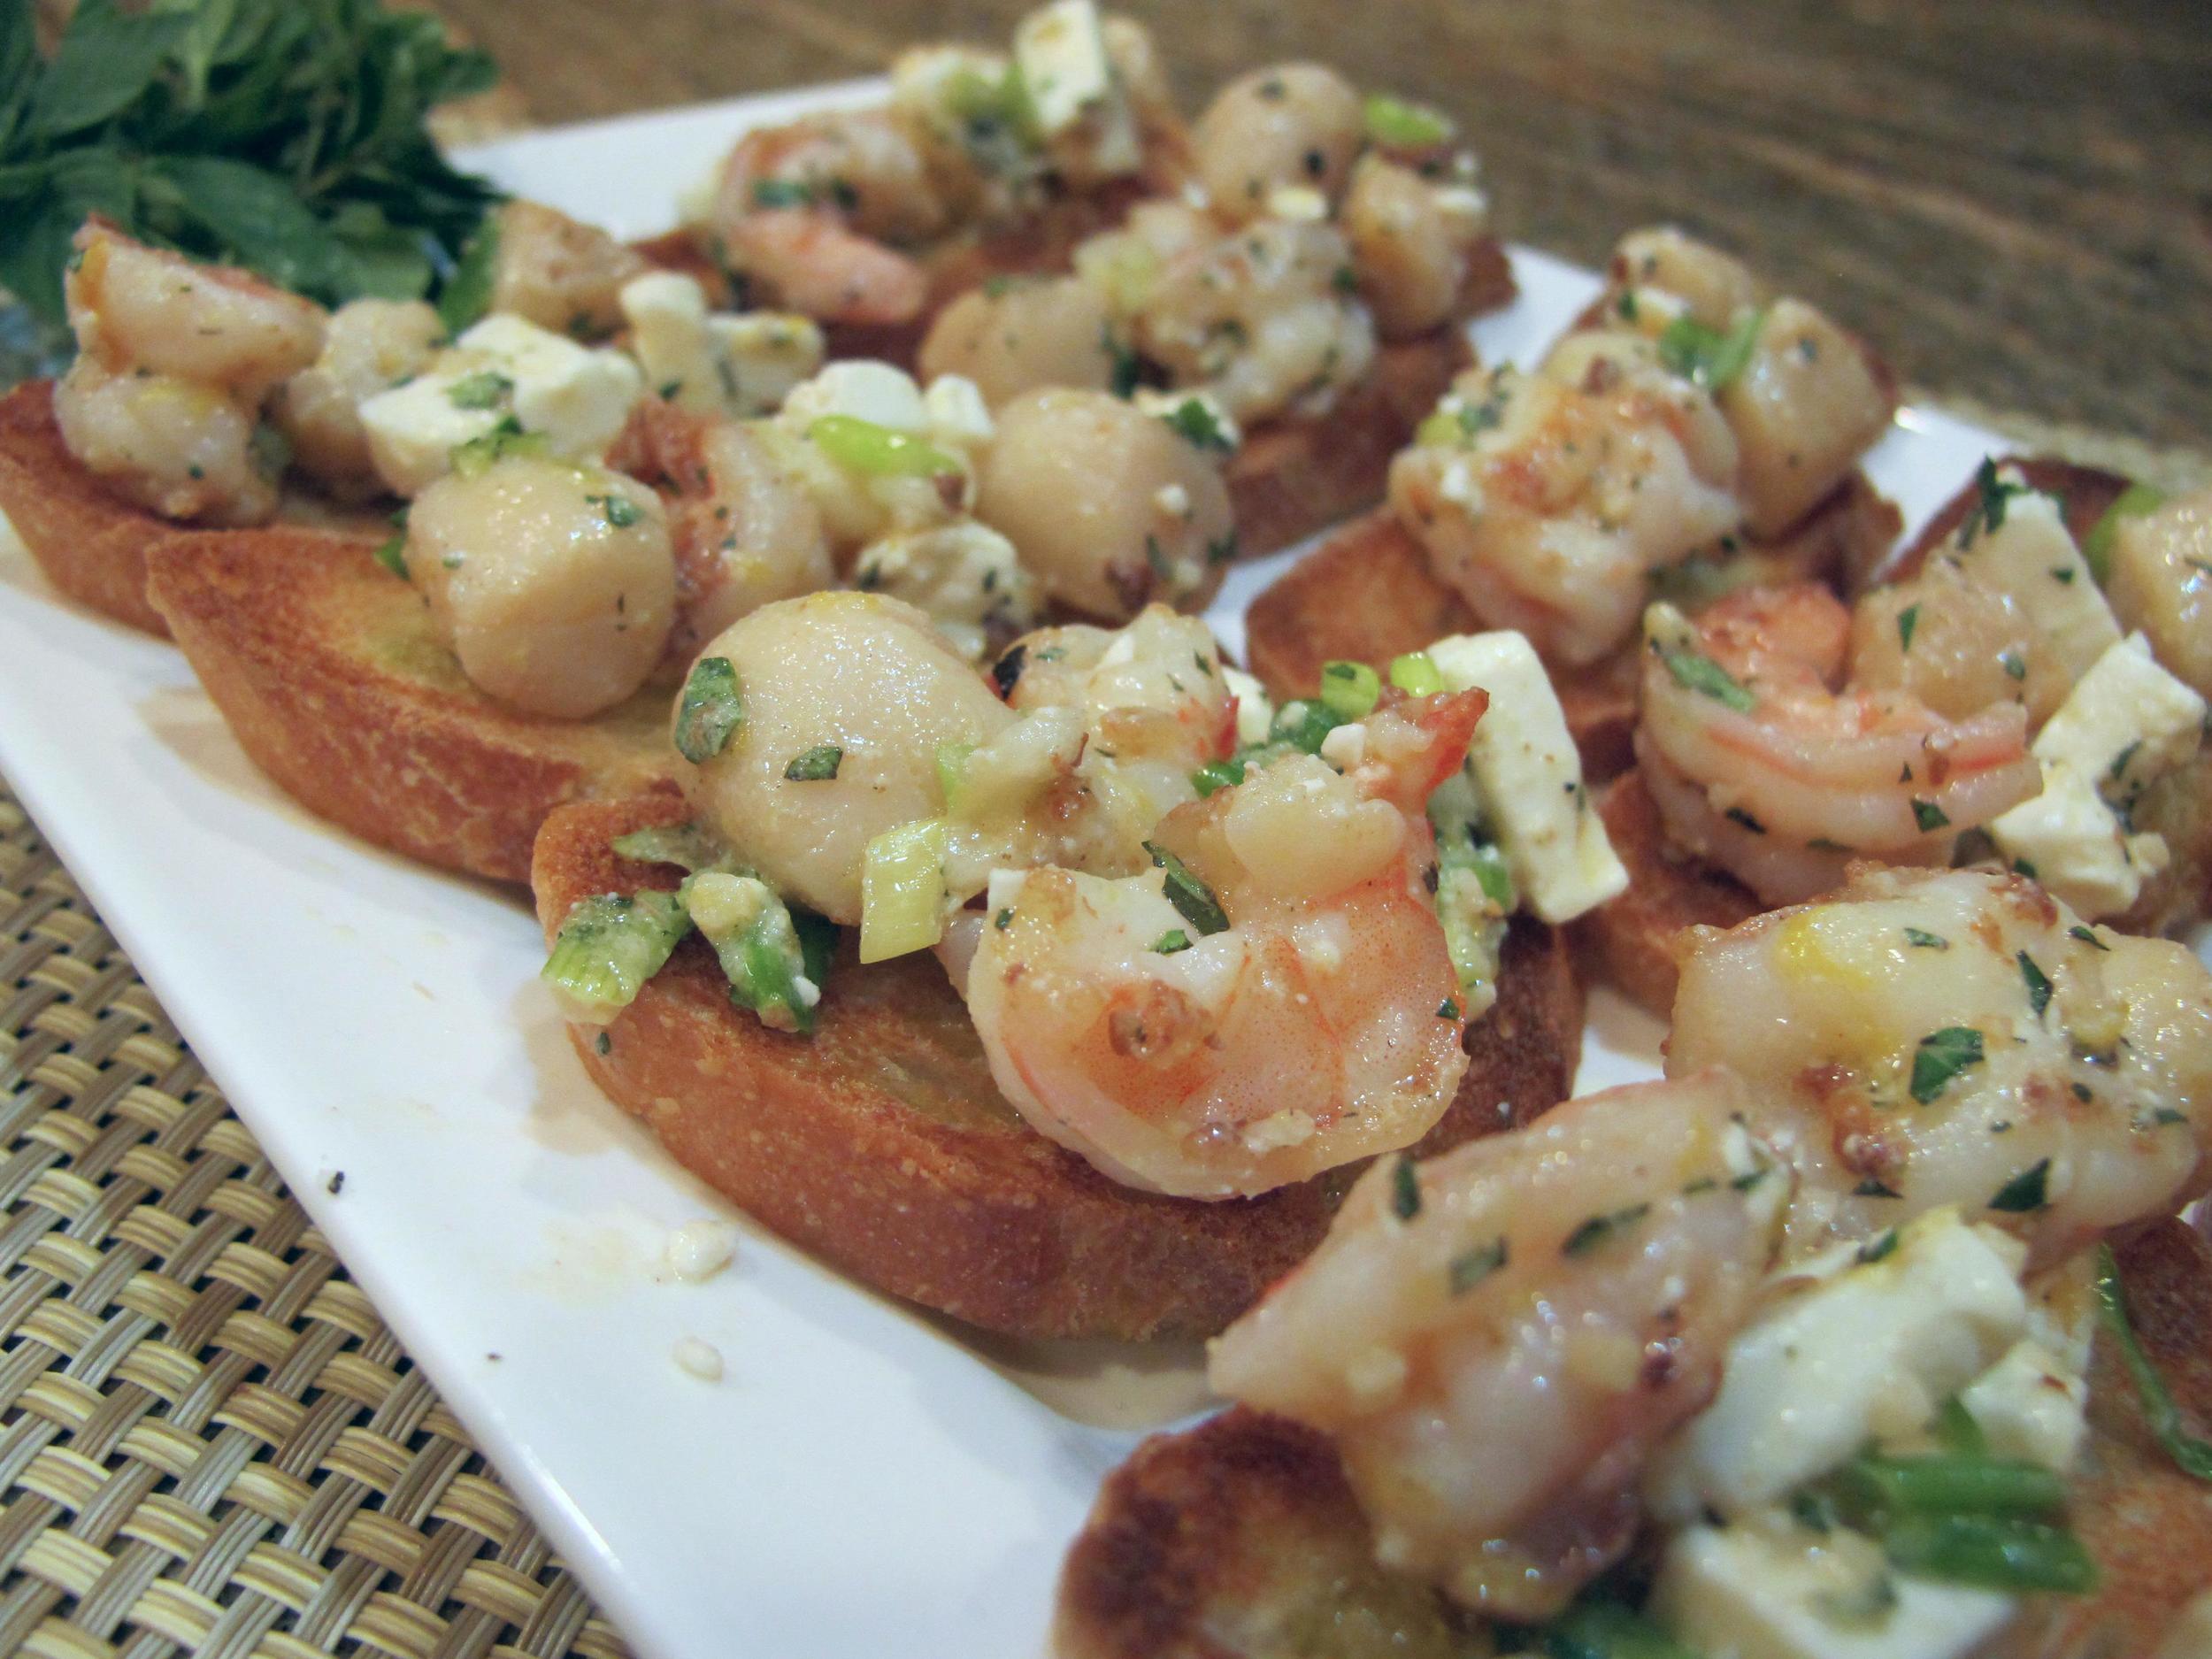 Shrimp and Scallops with Feta, Fresh Oregano and Lemon over Crostinis